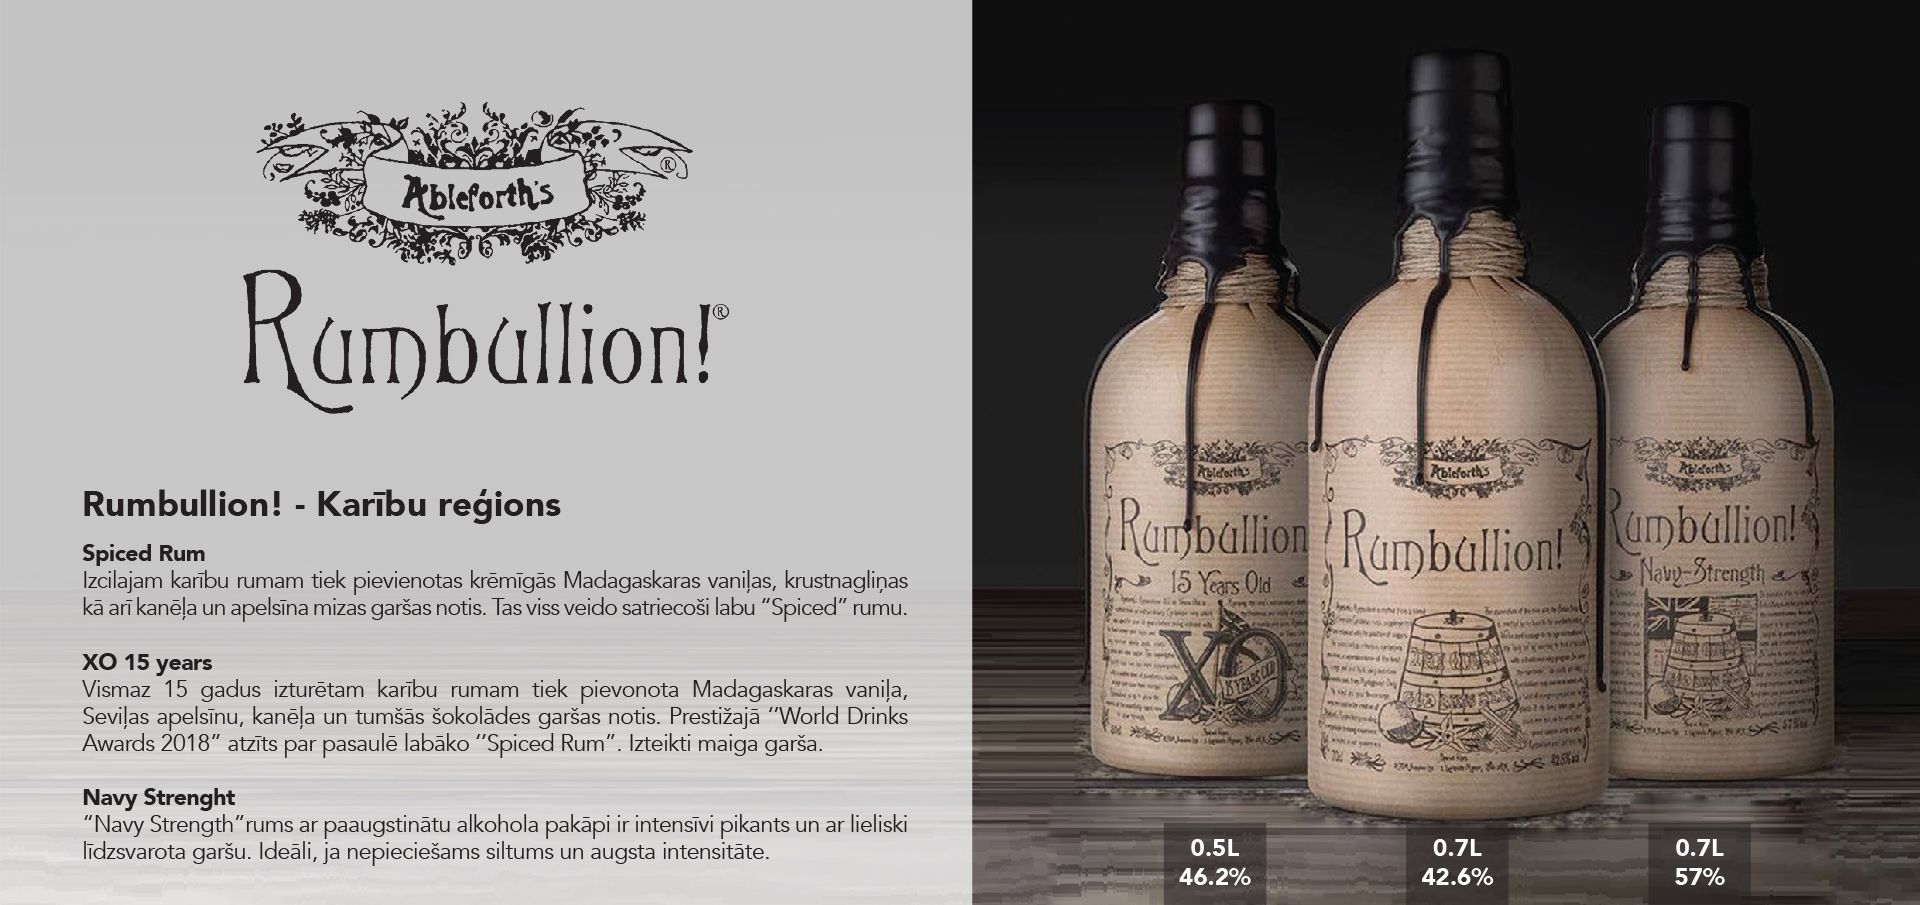 Rumbullion!n Rum - Karību reģions